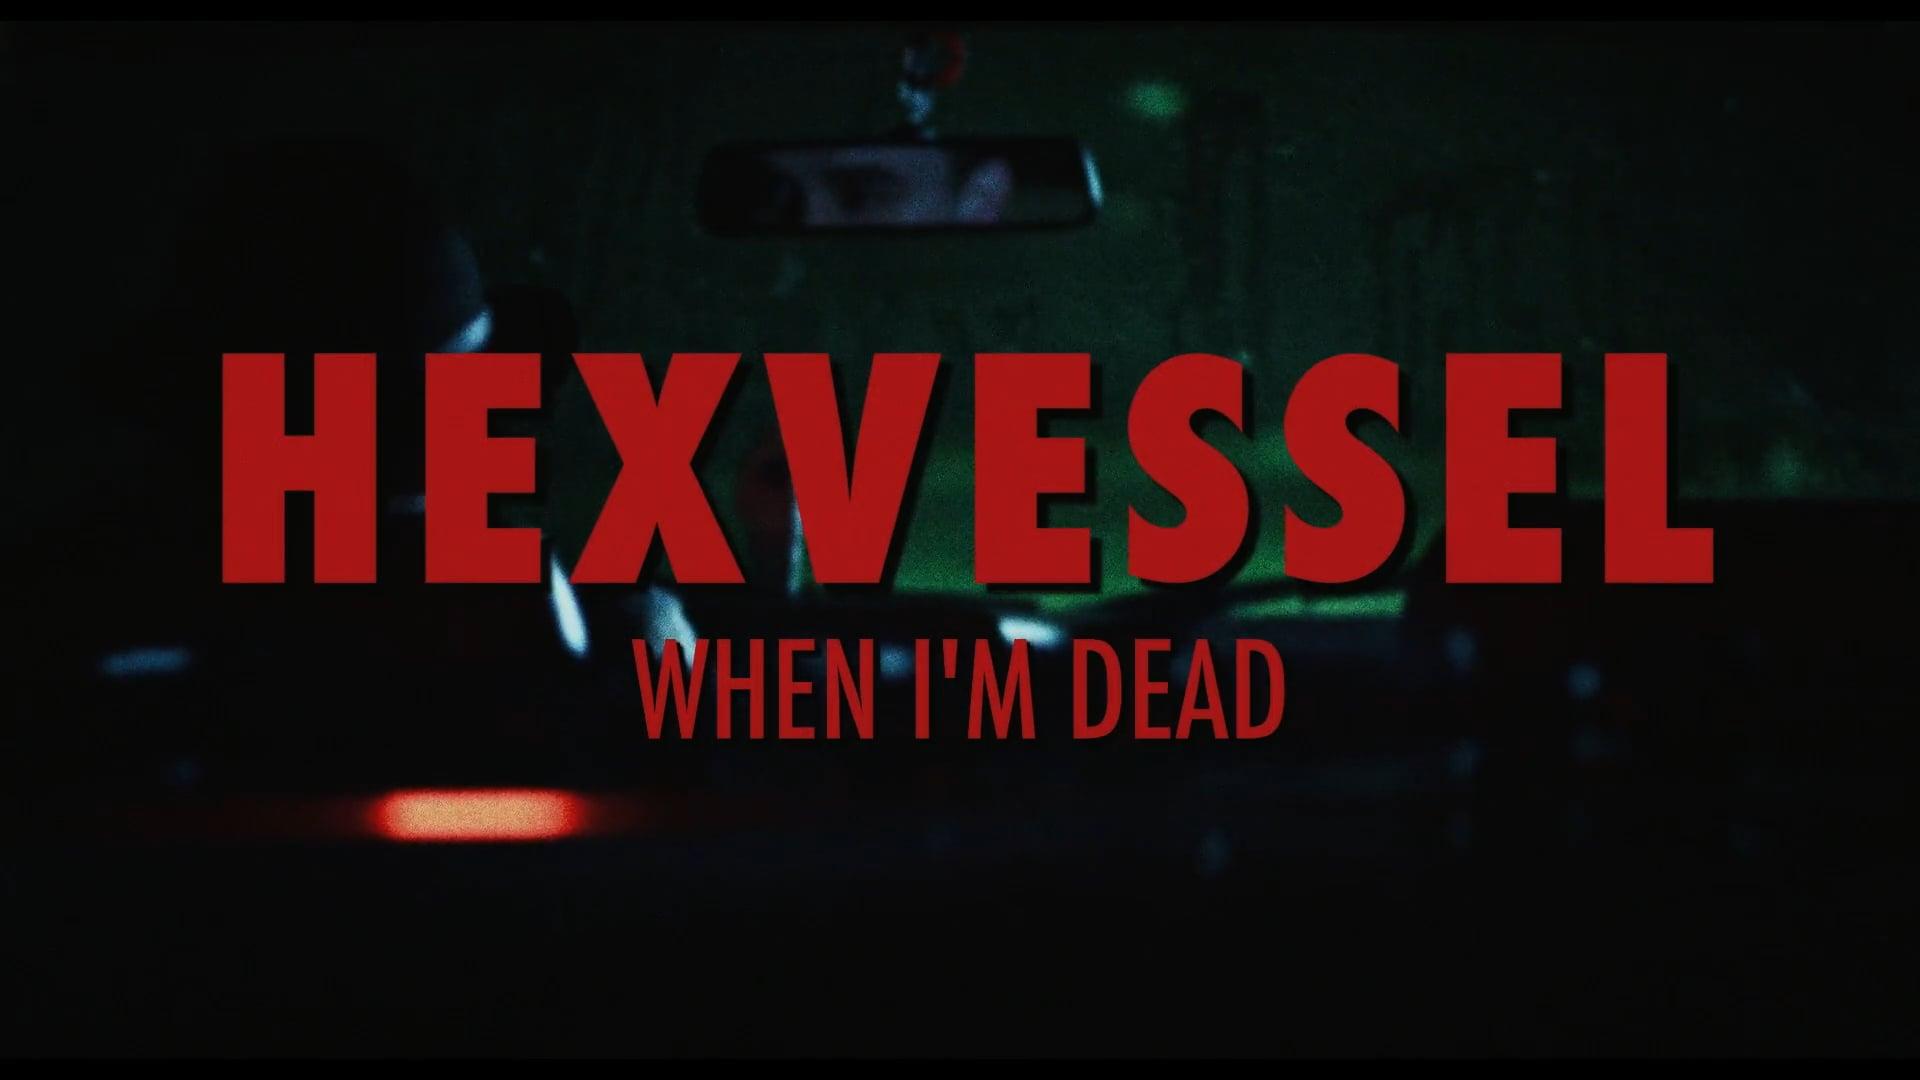 Hexvessel: When I'm Dead (2016)